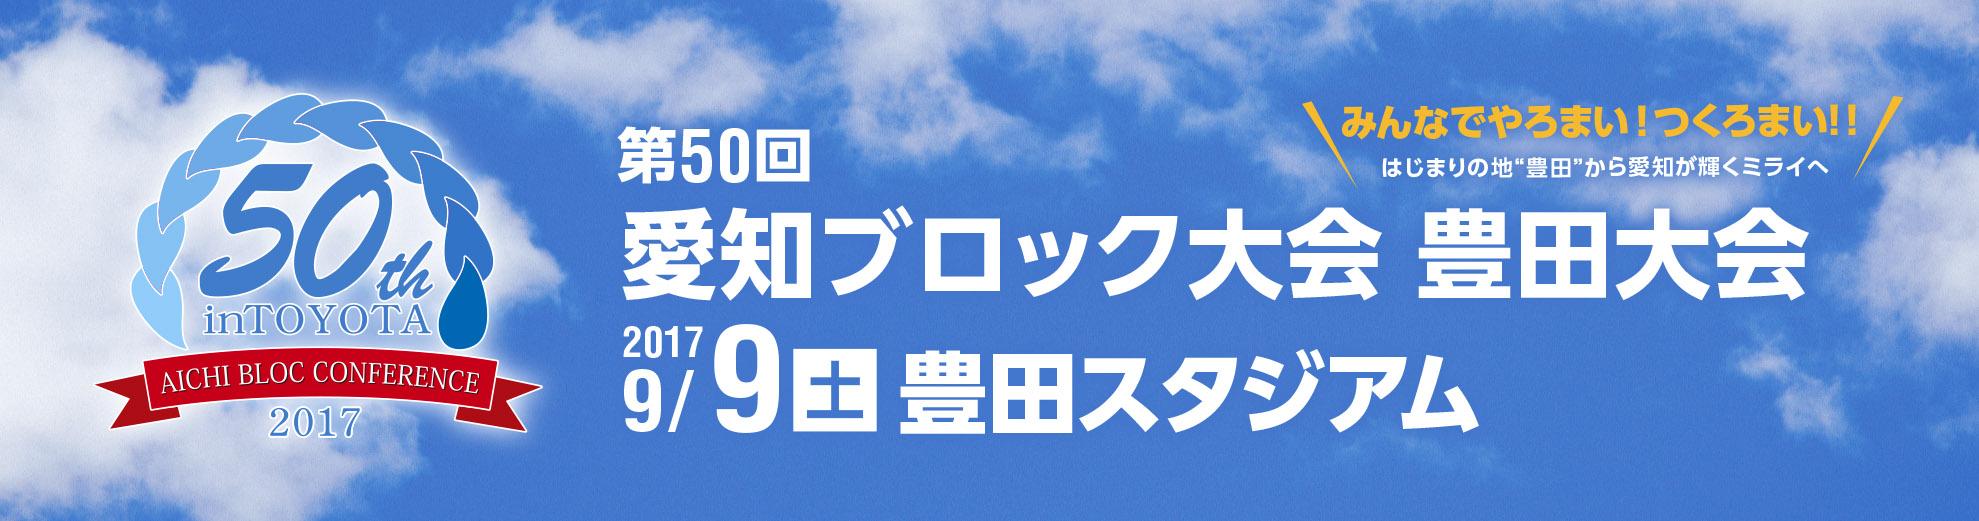 愛知ブロック大会 豊田大会